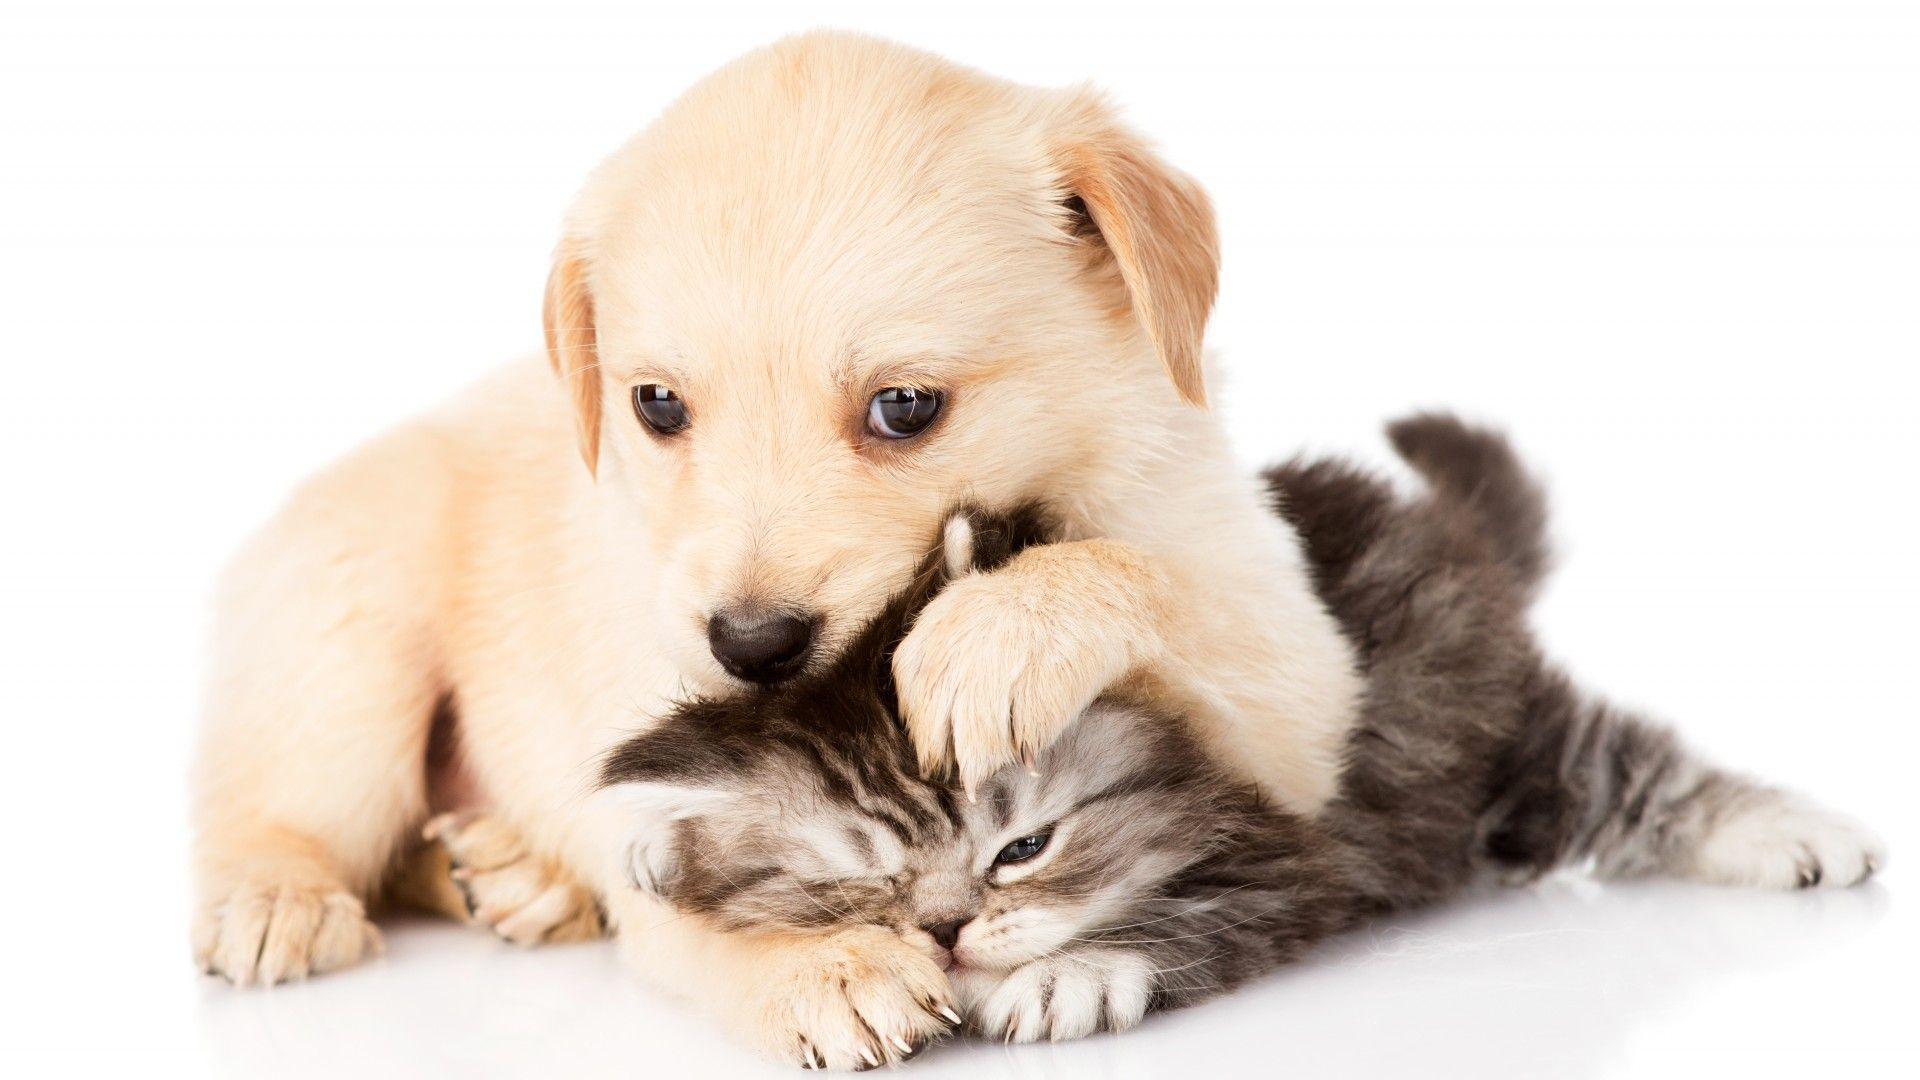 Kitten And Puppy Wallpaper Free Kittens And Puppies Puppy Wallpaper Golden Retriever